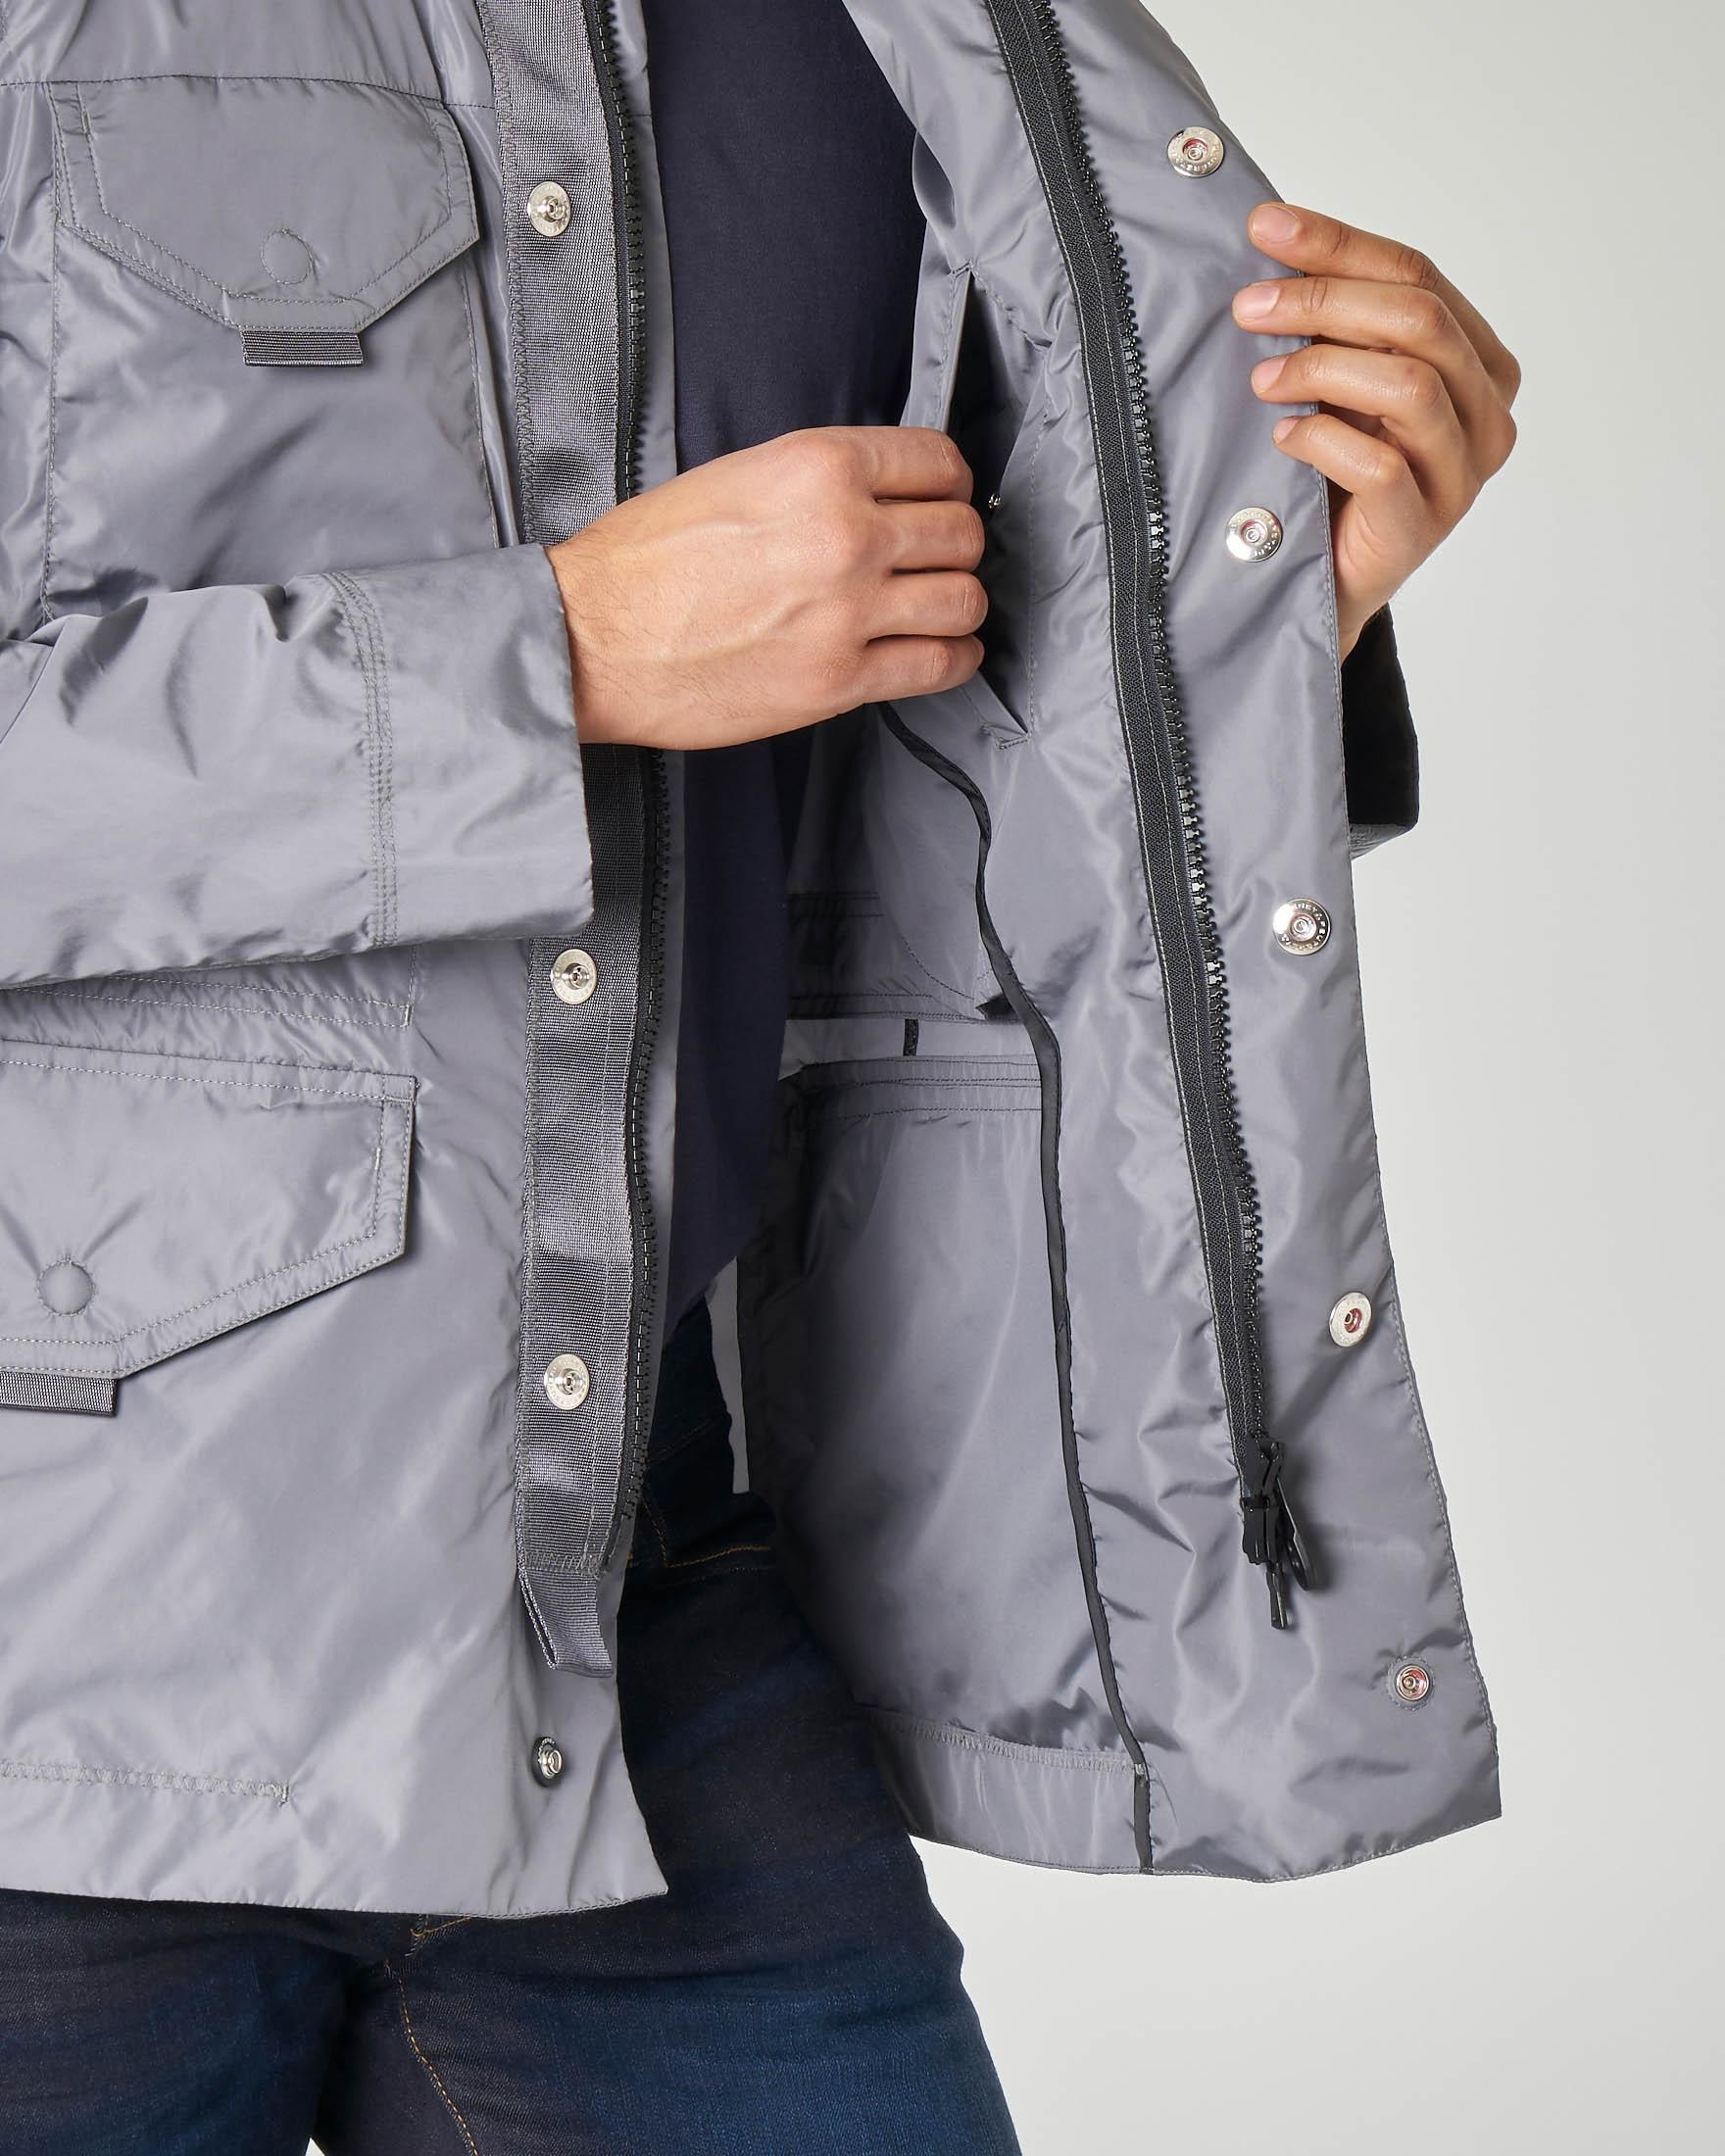 Field jacket grigia in nylon cangiante